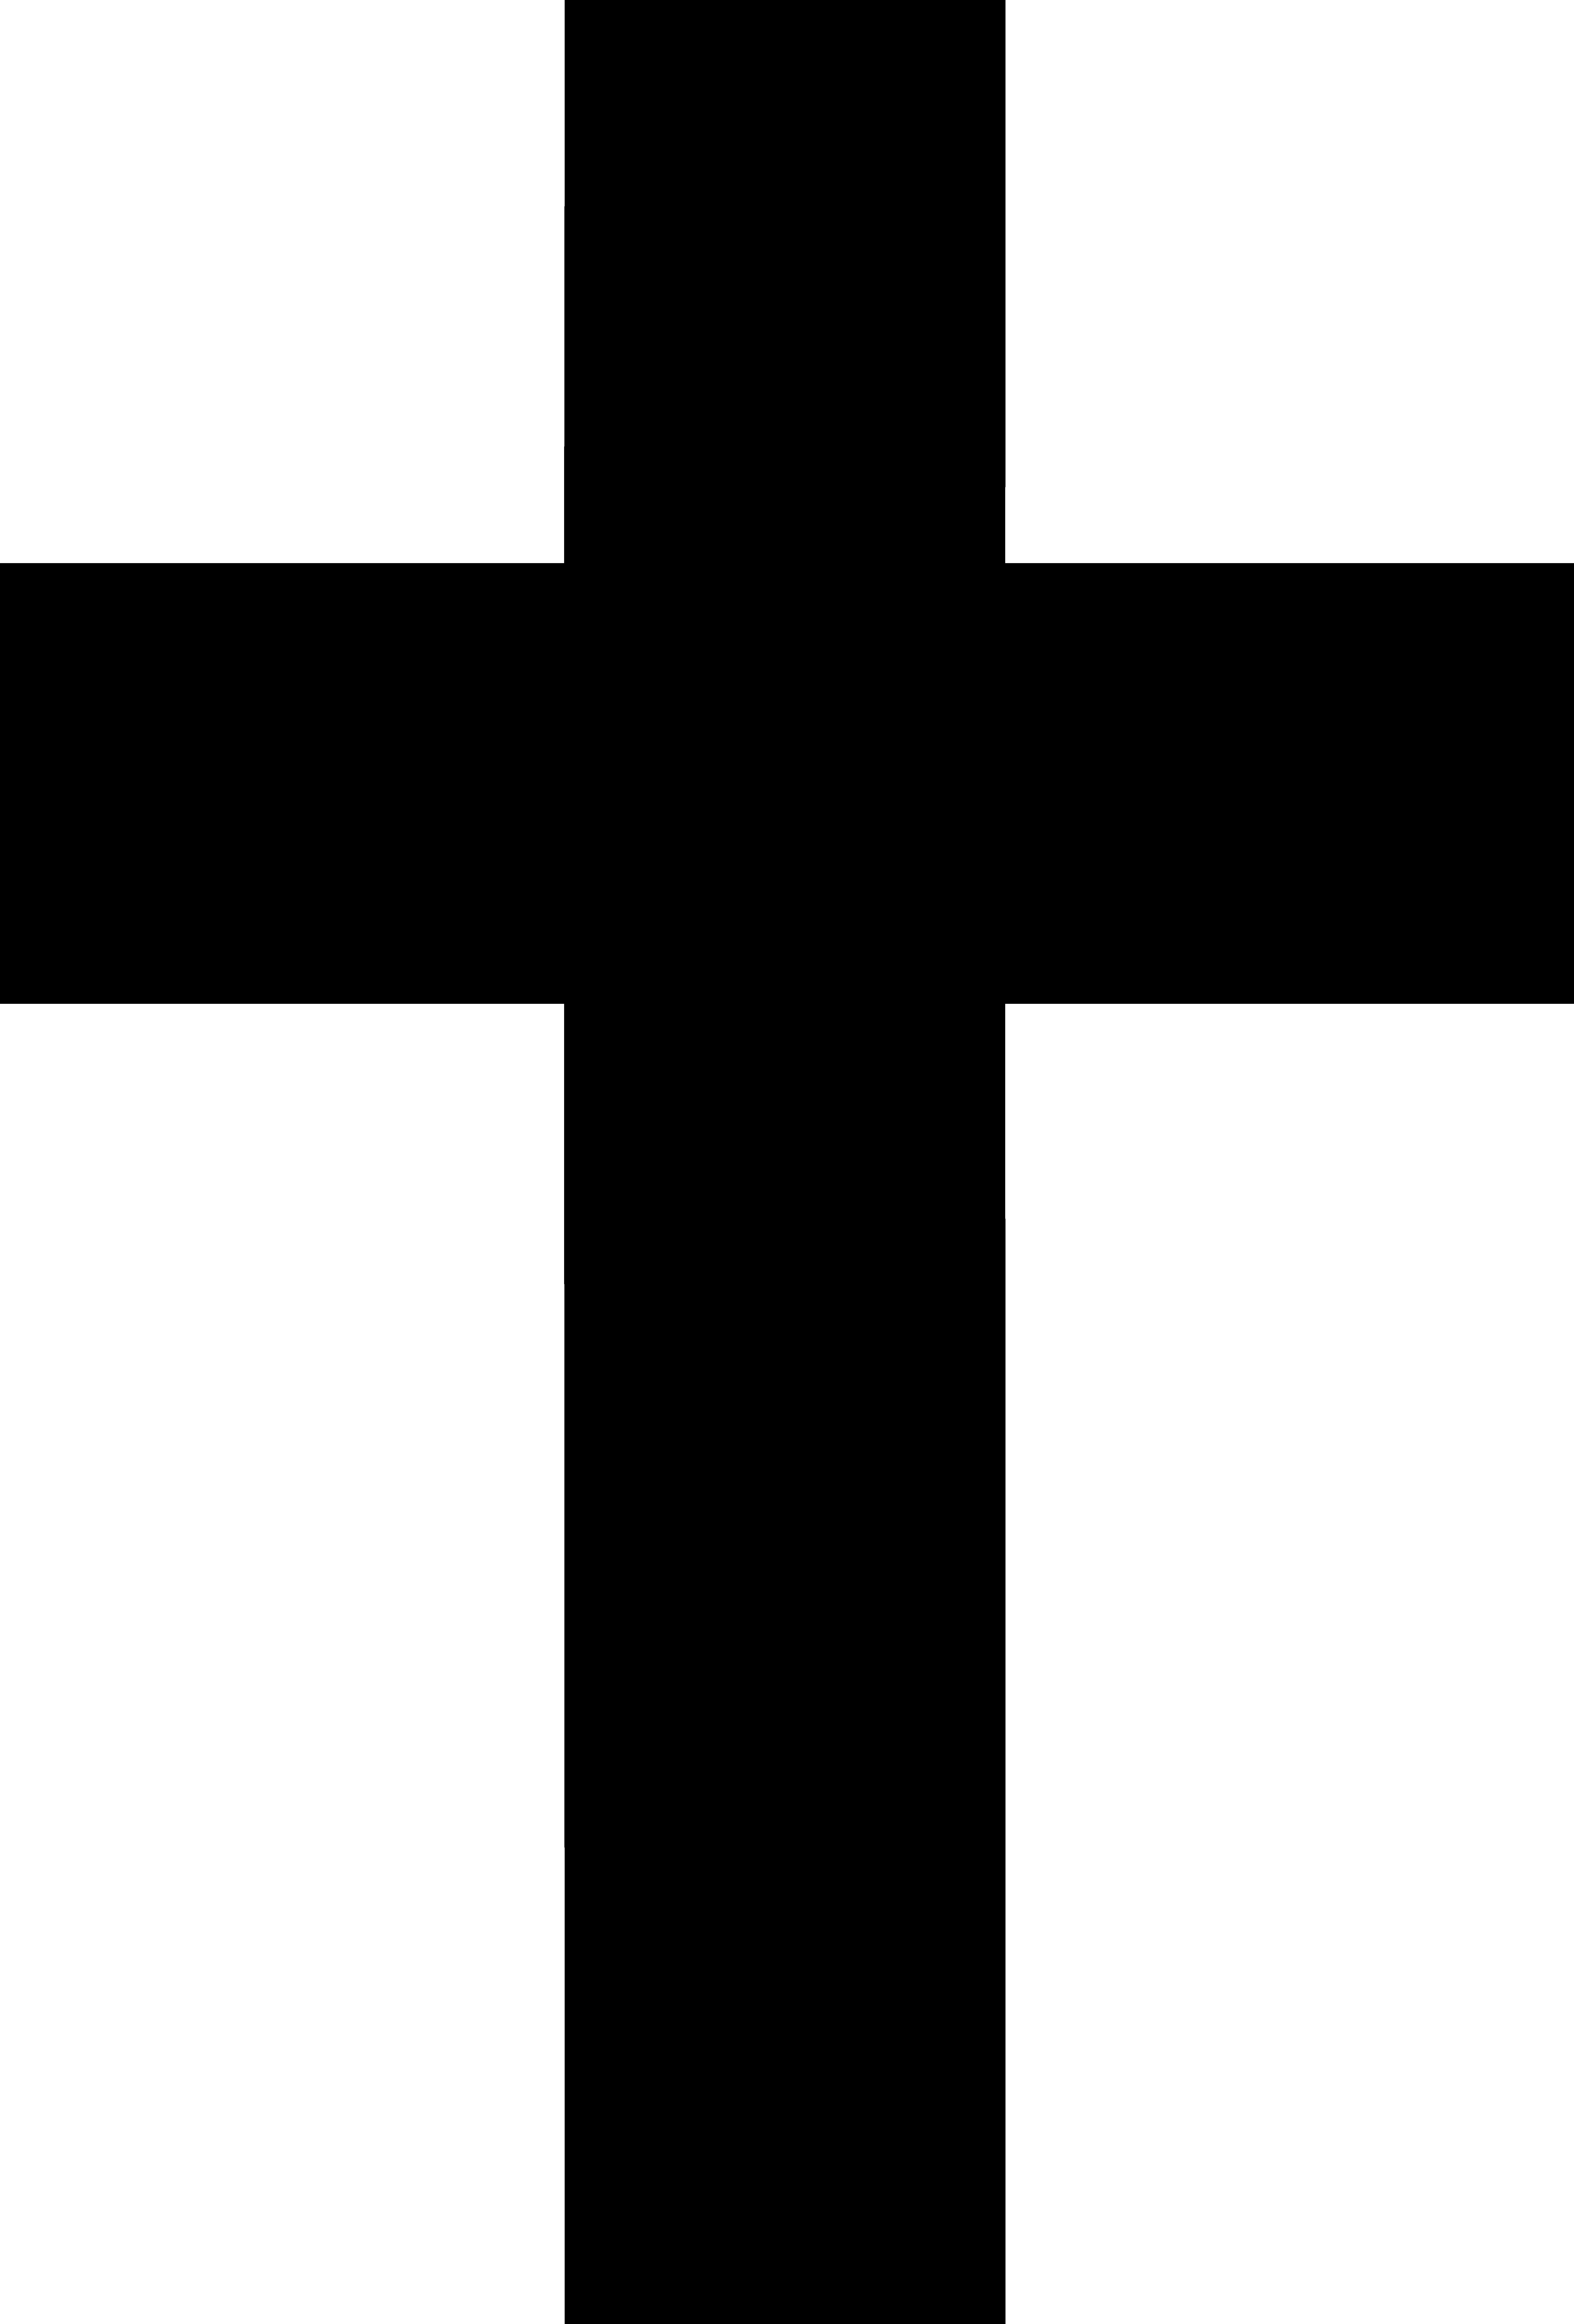 5720x8448 Black Cross Silhouette Design